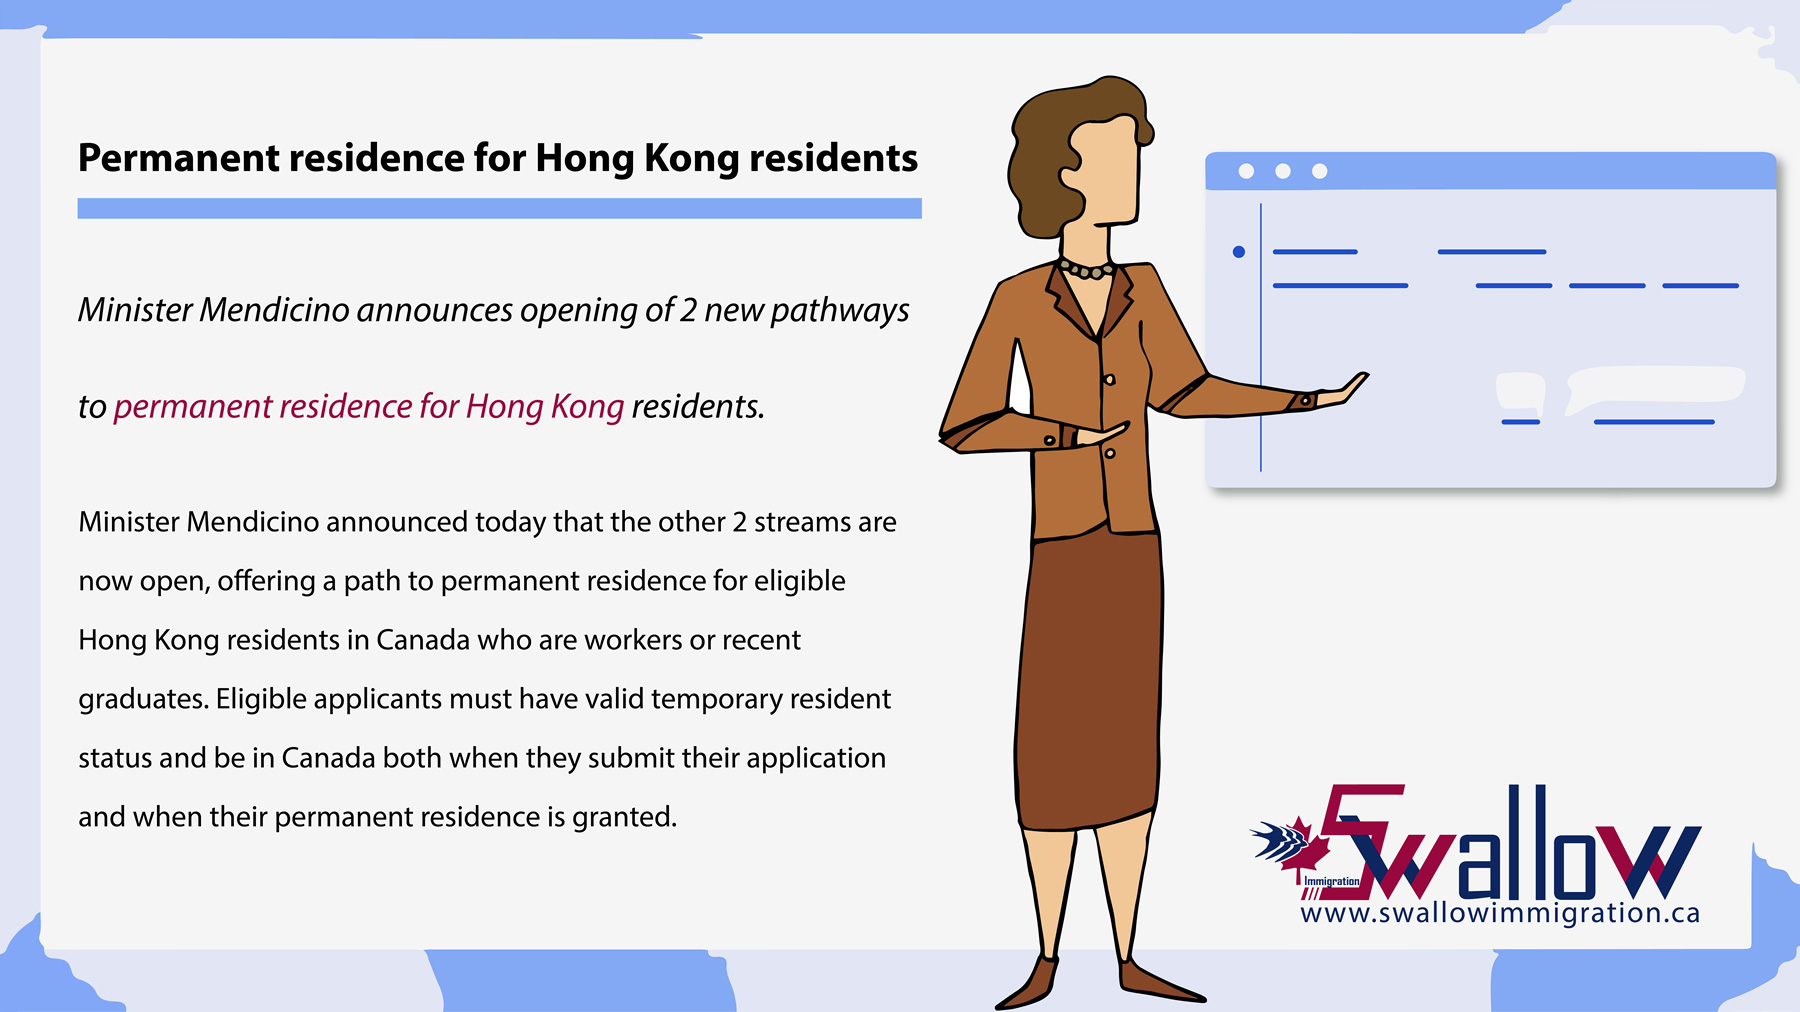 permanent residence for Hong Kong residents